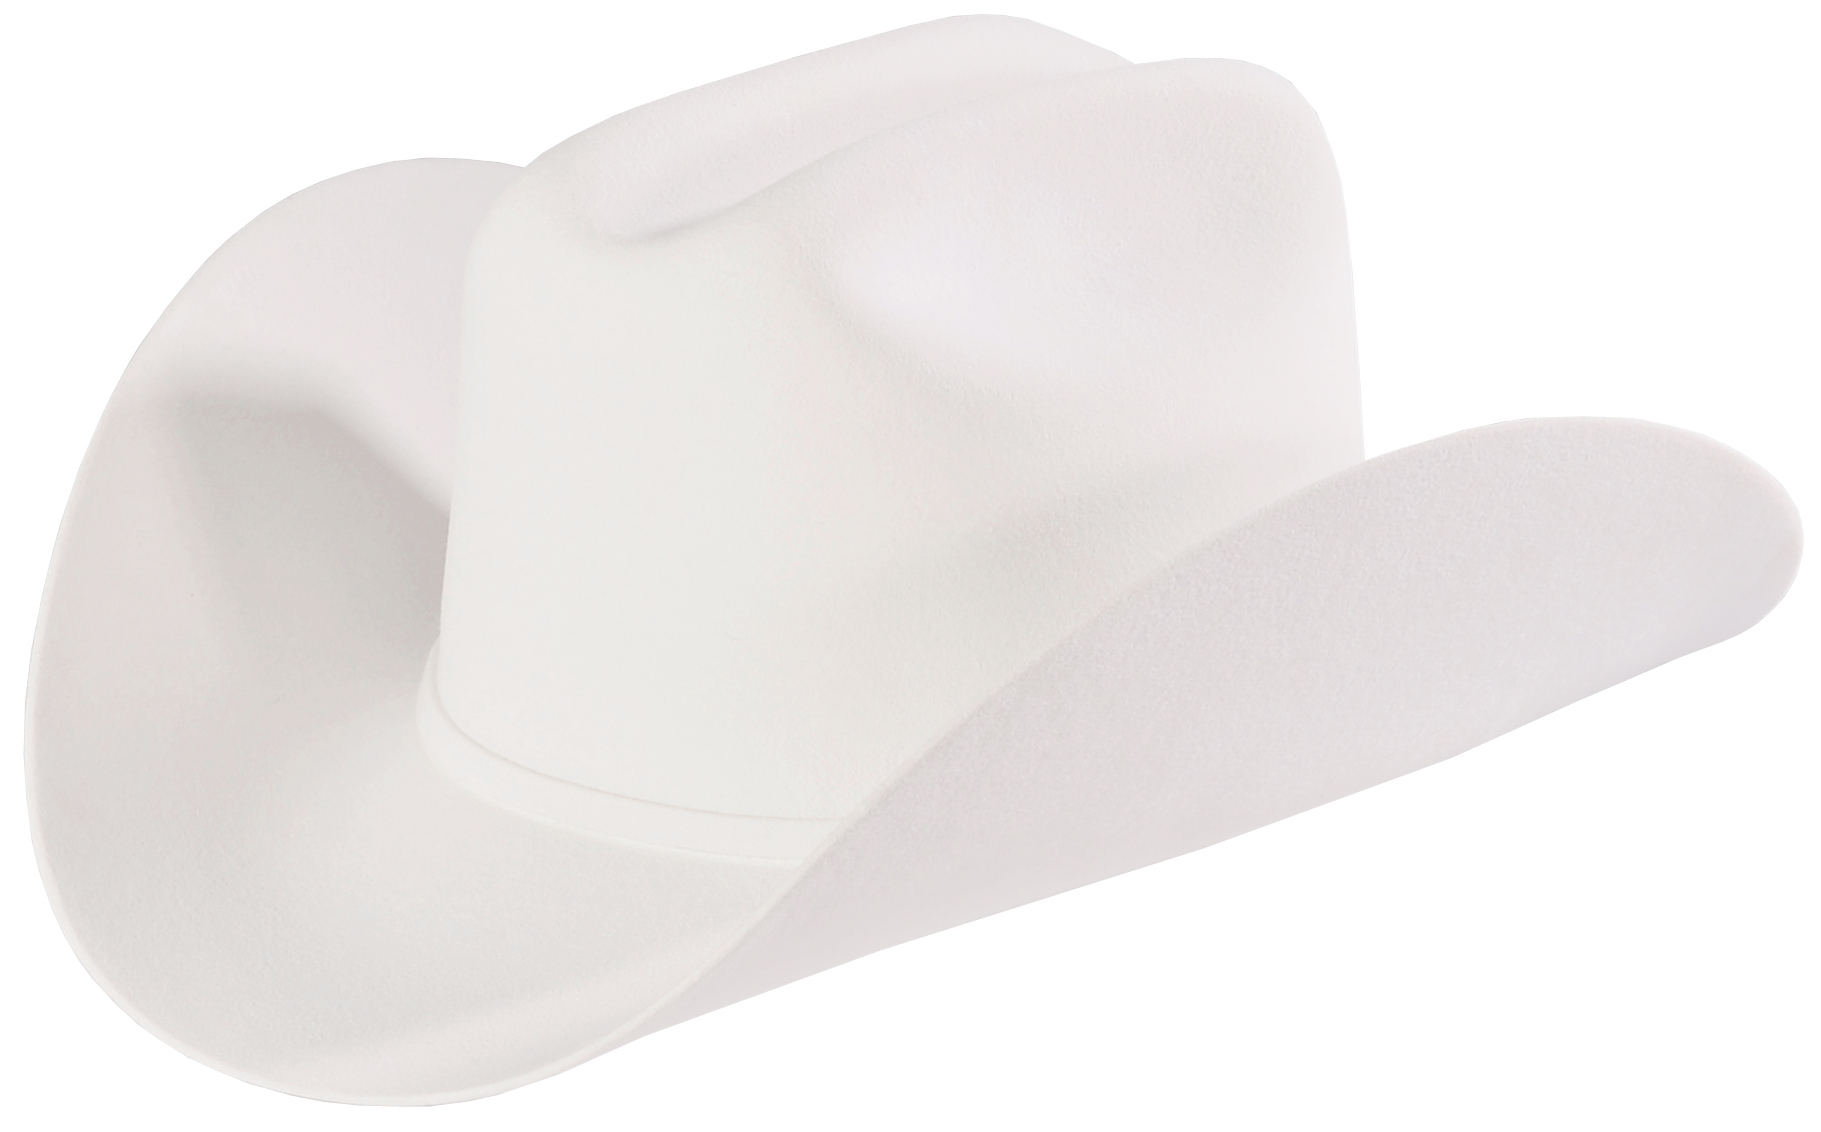 b36f5d6ae0d Serratelli Men s White 10X Fur Felt Boss Cowboy Hat - Country Outfitter